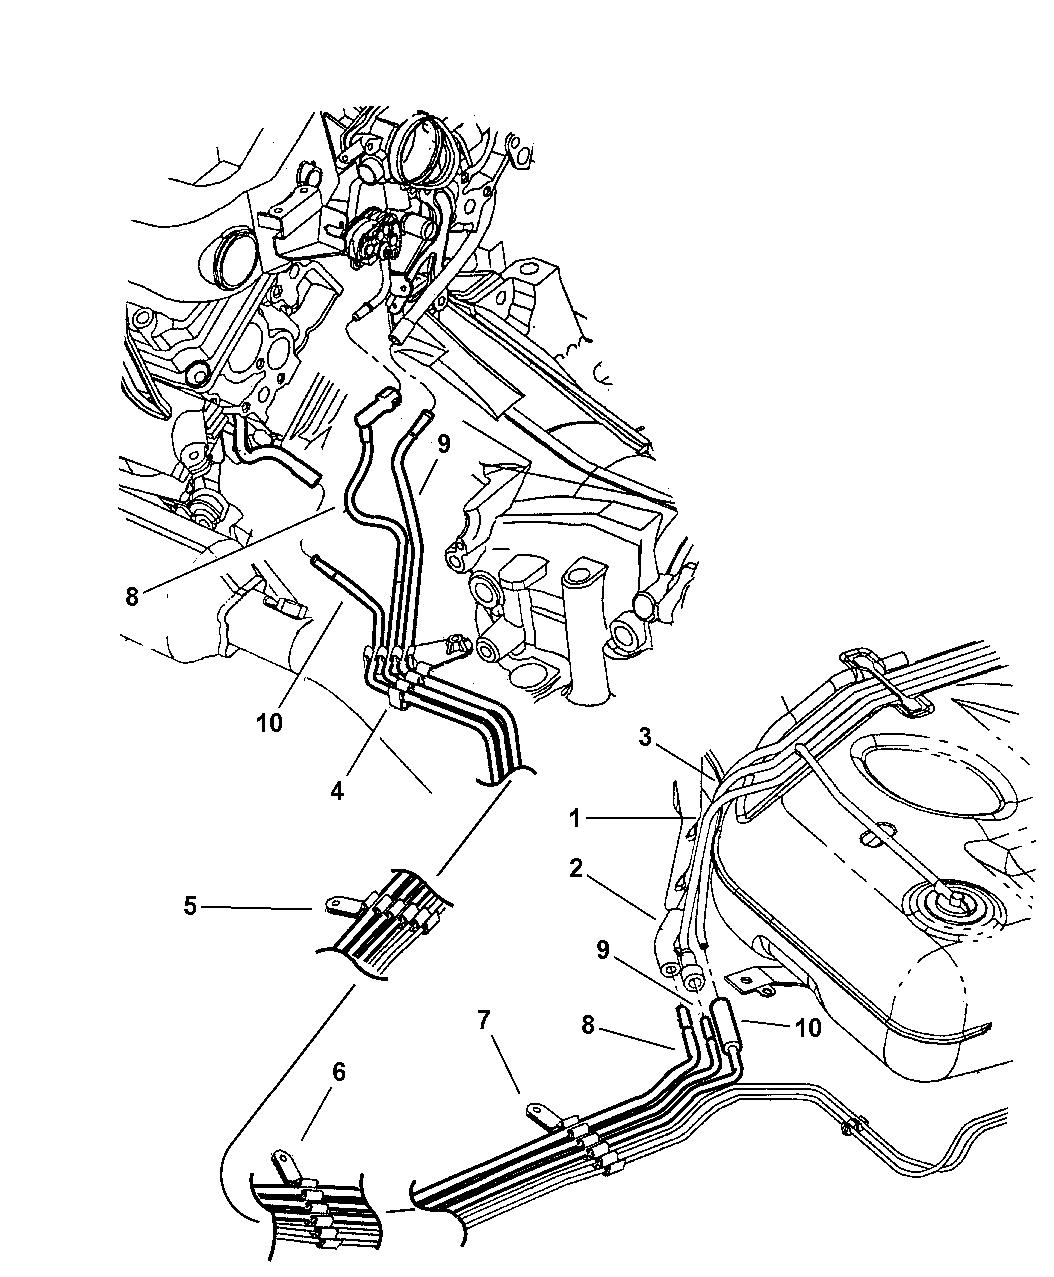 chrysler concorde engine diagram | wiring diagram post relate  skyracemontedimon.it